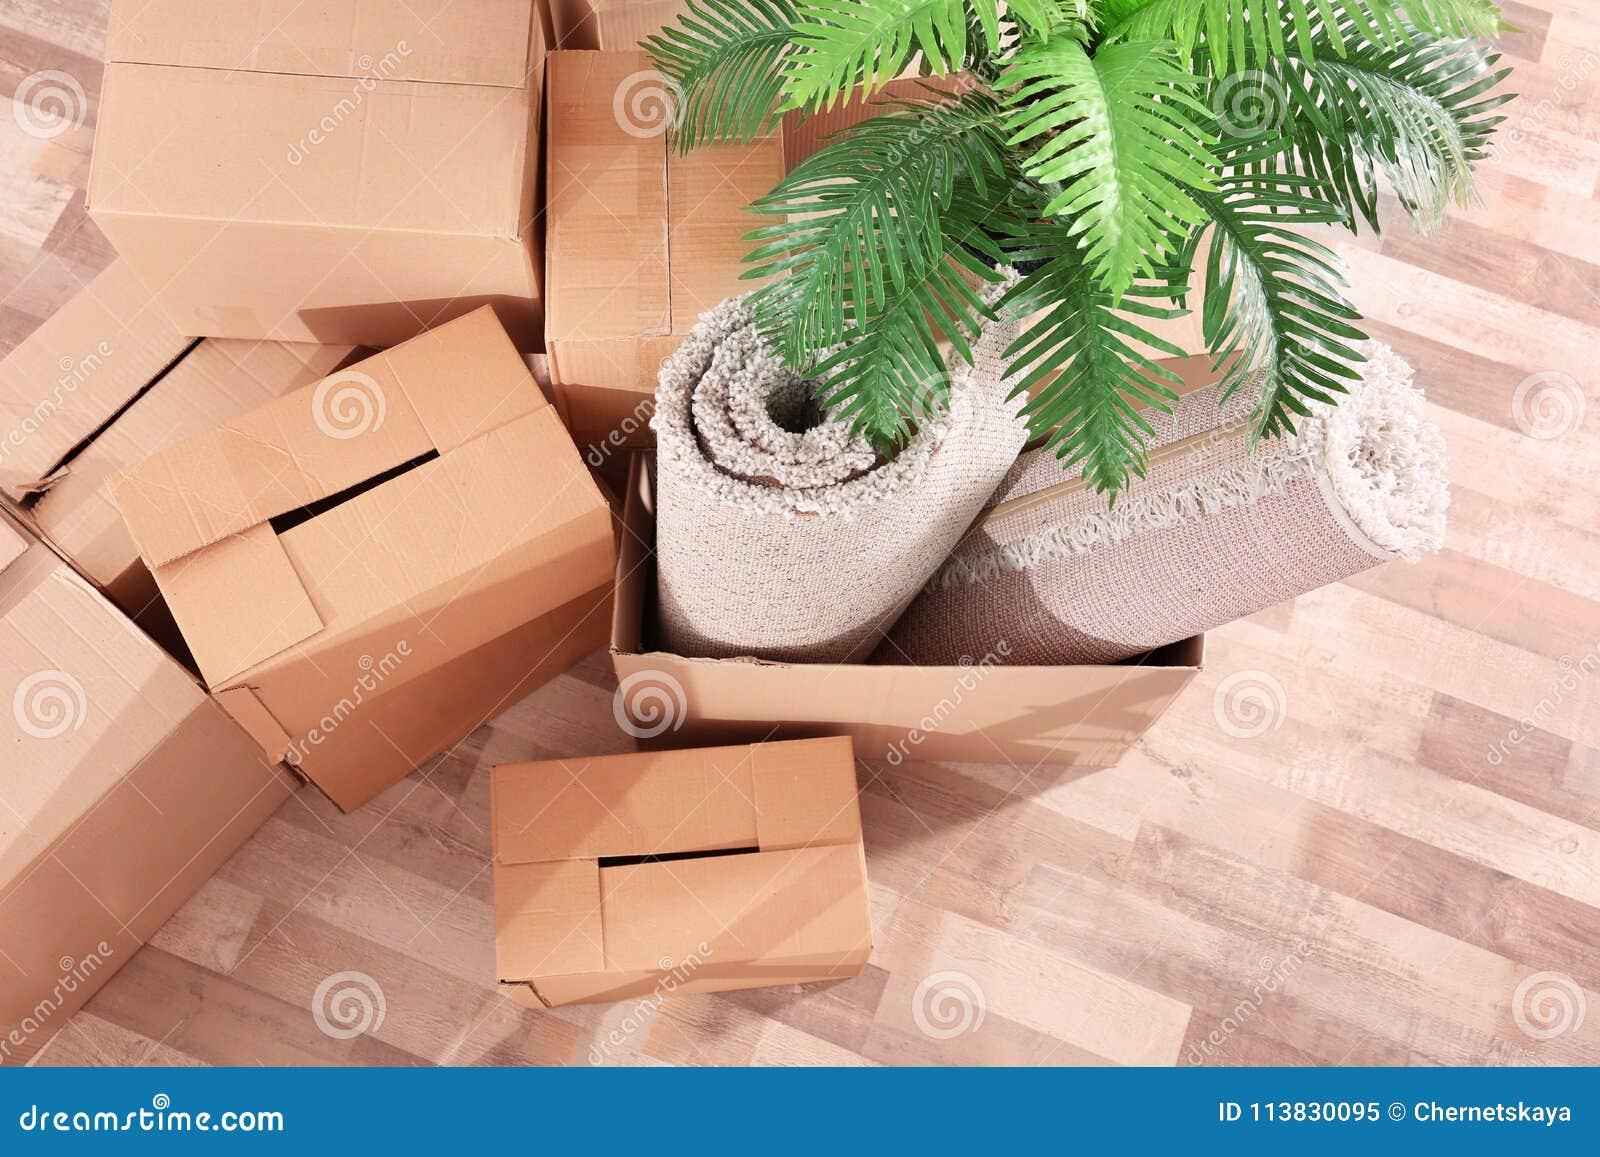 Pila de cajas para moverse